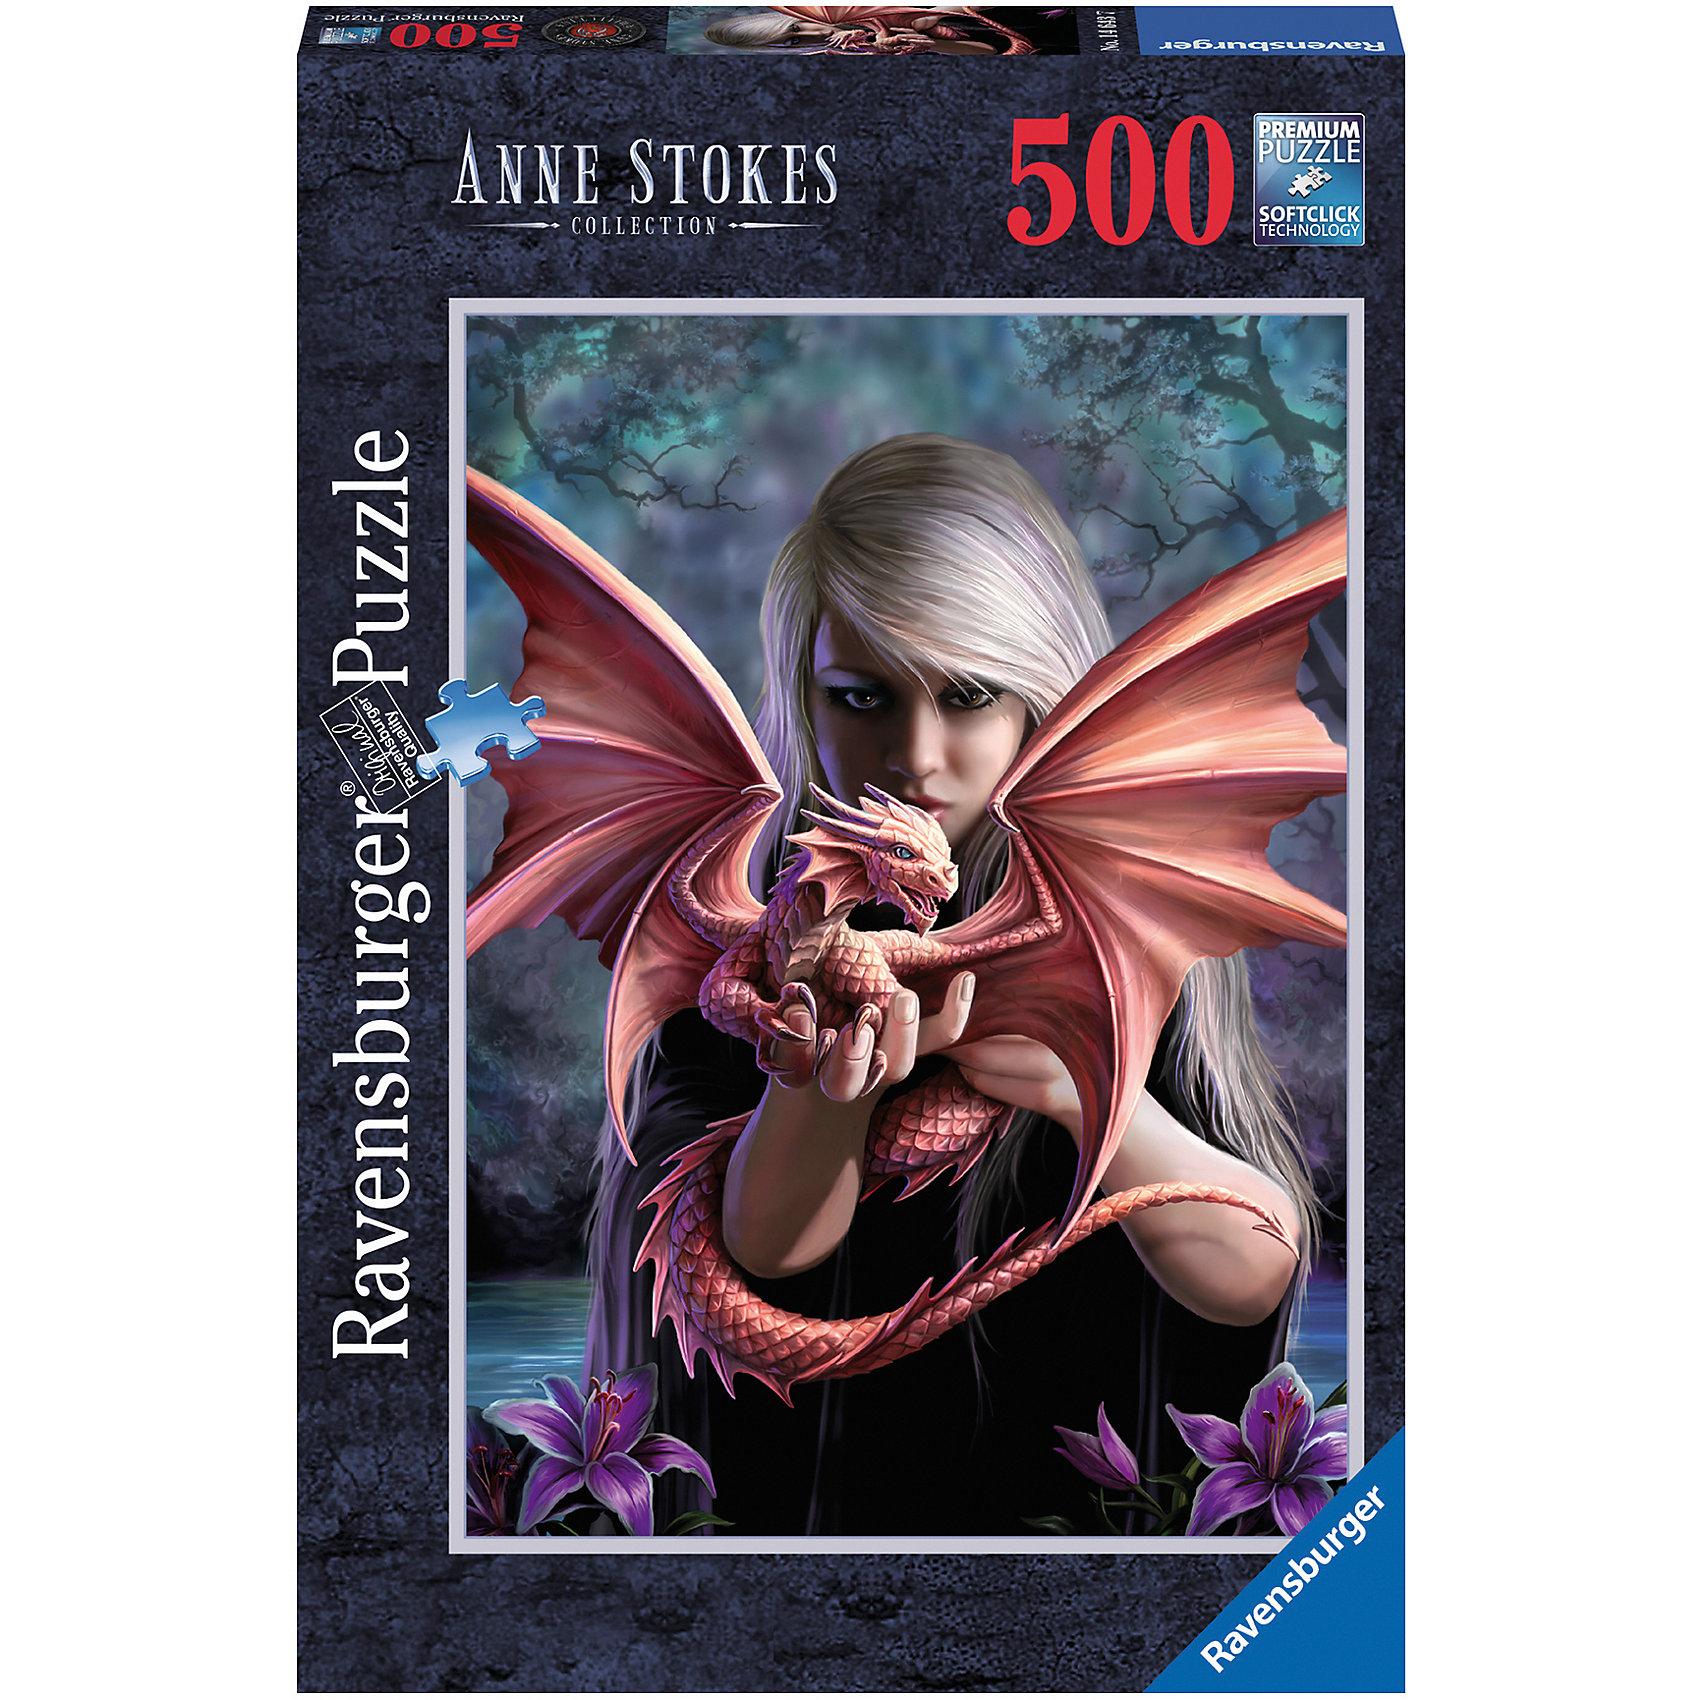 Ravensburger Пазл «Девушка с драконом» , 500 деталей, Ravensburger пазл для раскрашивания арт терапия царь зверей origami 360 деталей